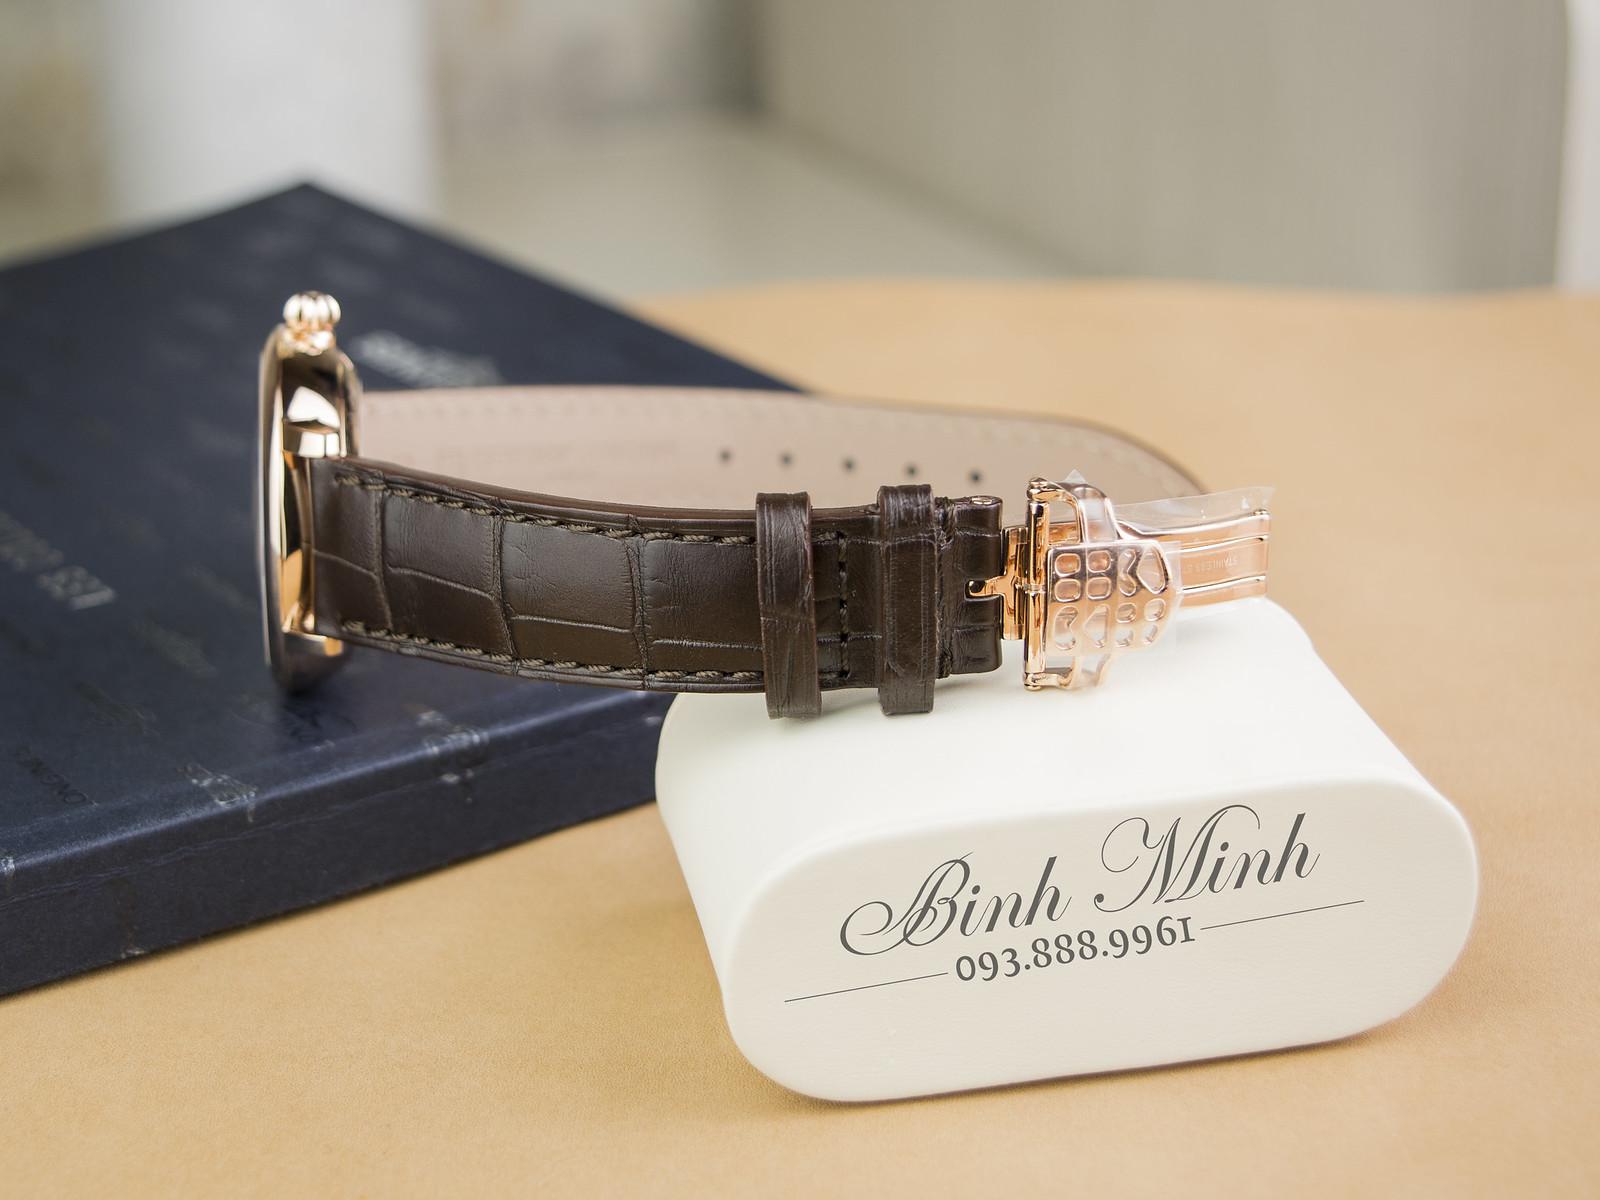 Đồng hồ Frederique Constant Slimline Moonphase Manufacture Trăng sao máy inhouse mới nhất 2017, đủ hộp sổ thẻ, mới 100%